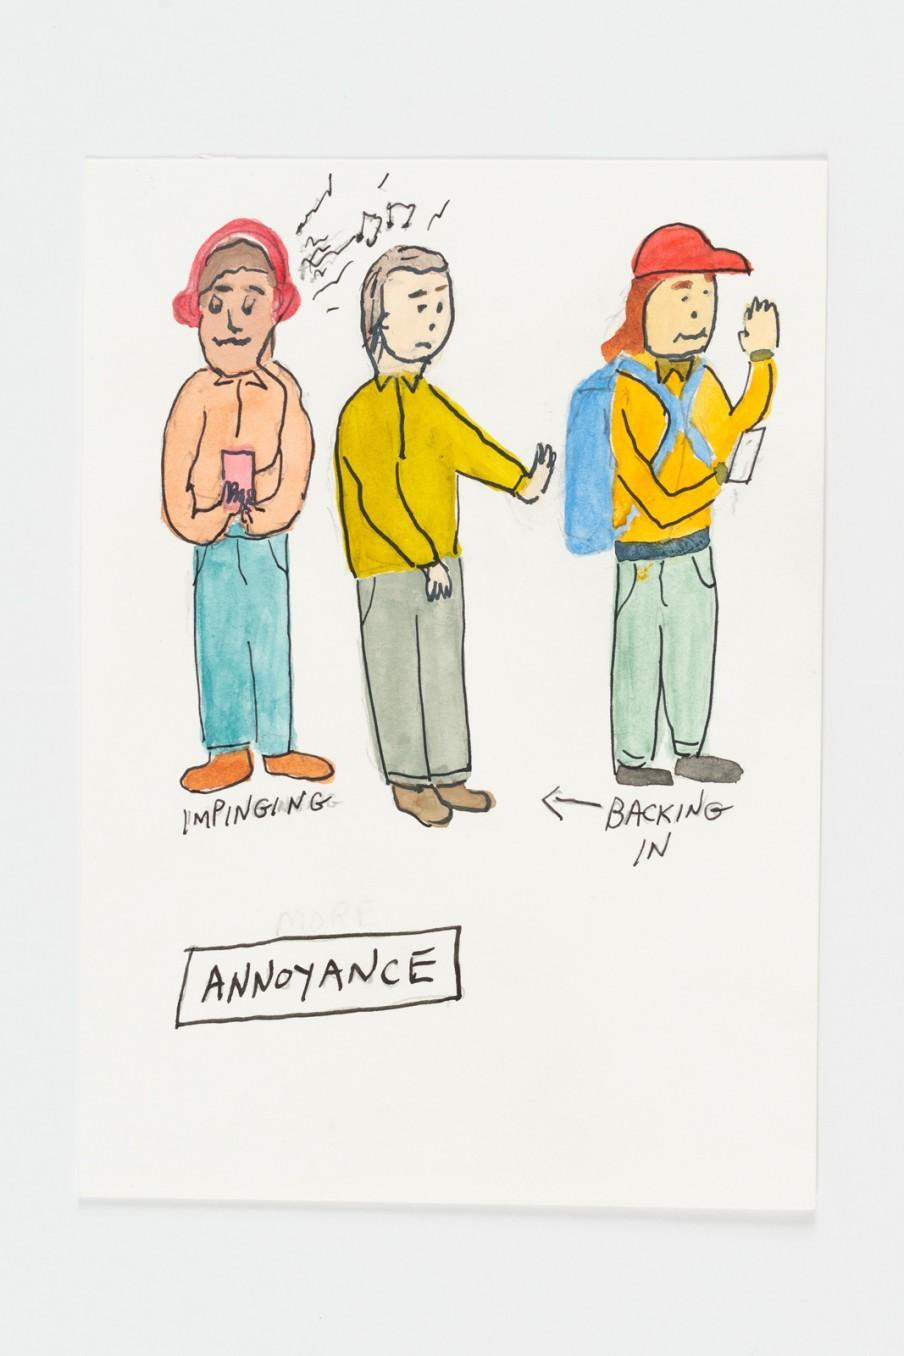 Michael Smith, Annoyance, 2015